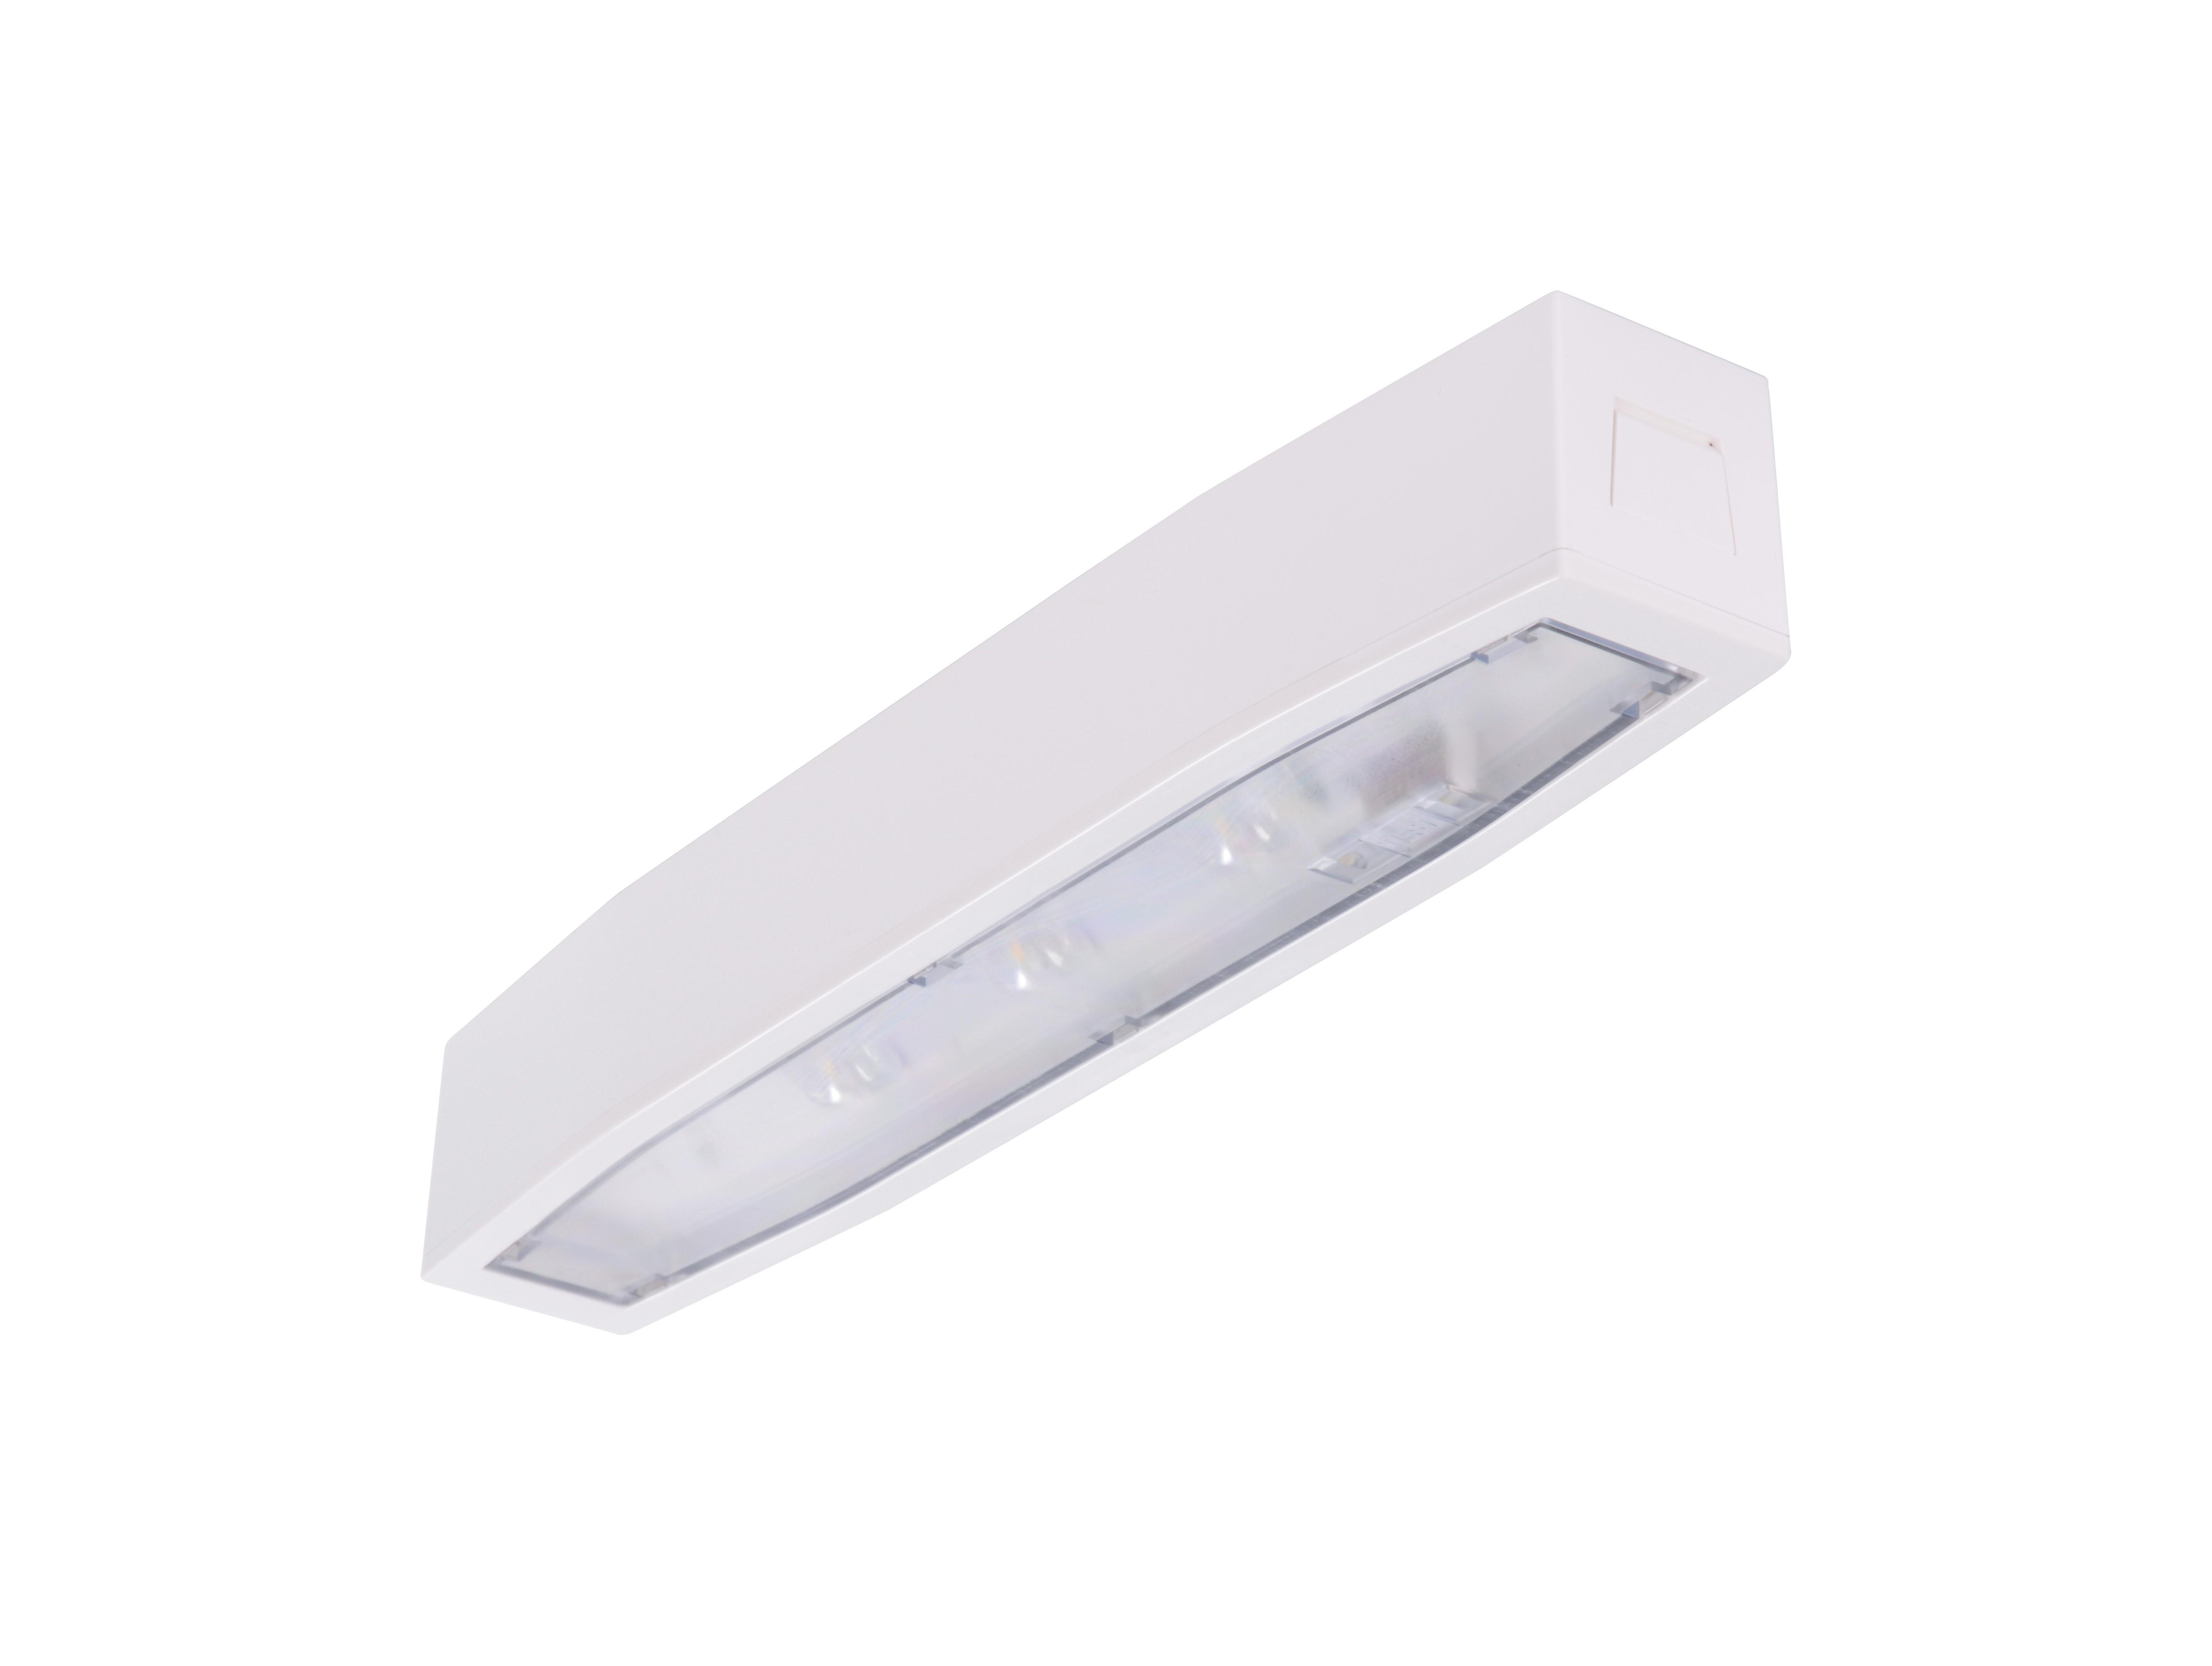 Lampa emergenta led Intelight 94658   3h mentinut test automat0